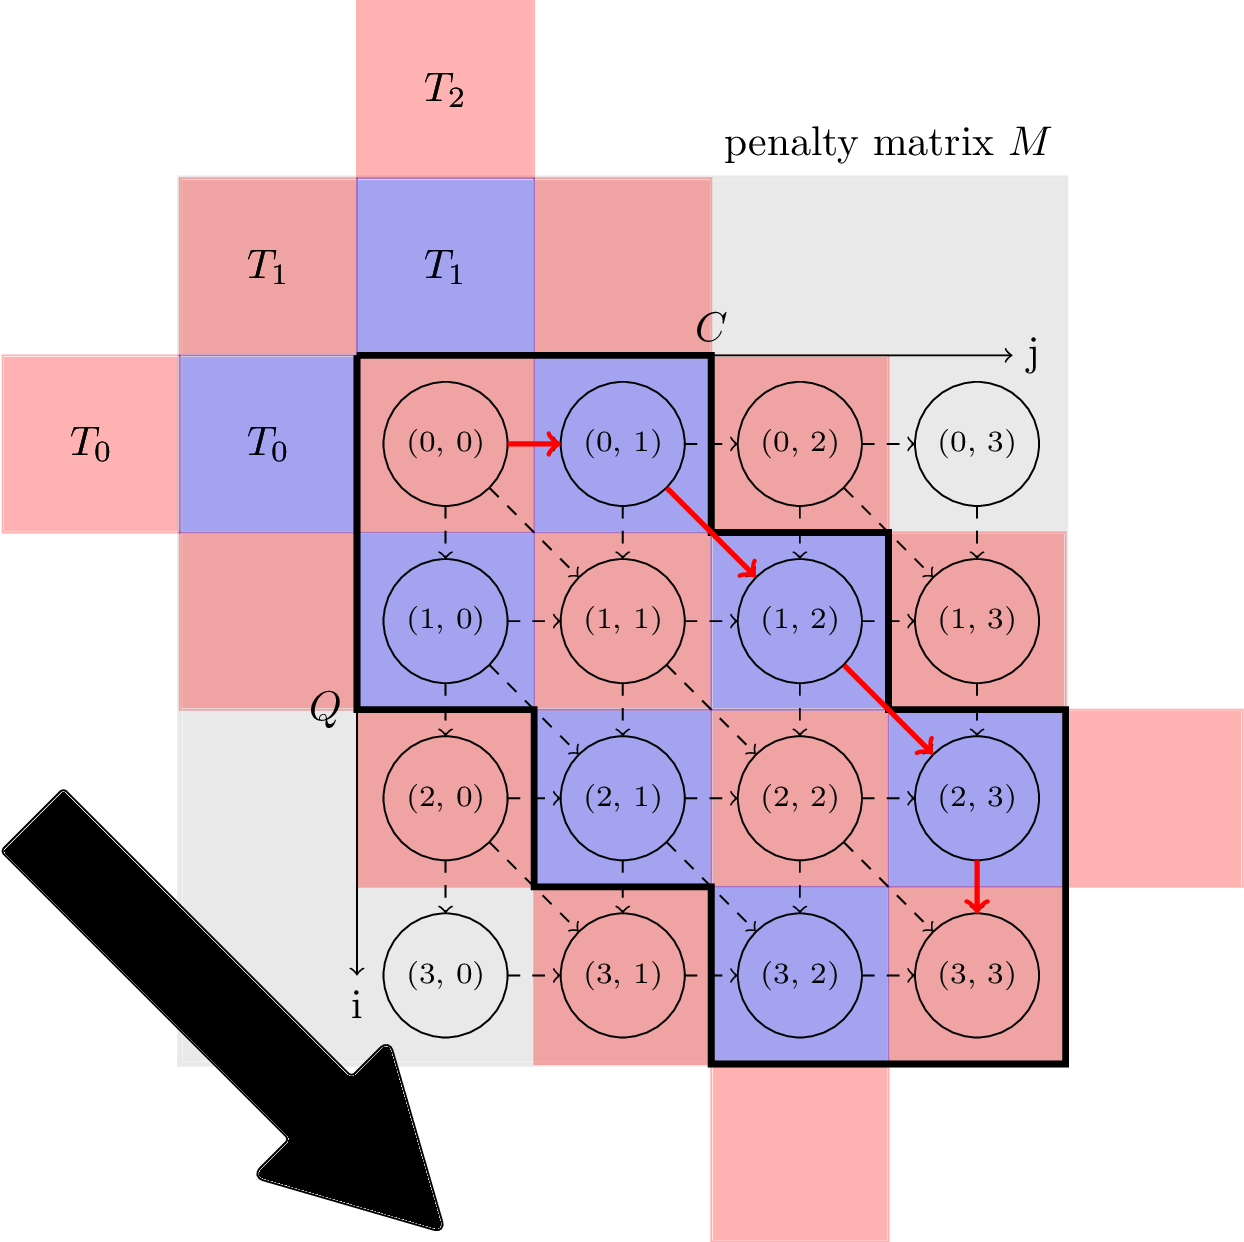 DTW diagonal scheme